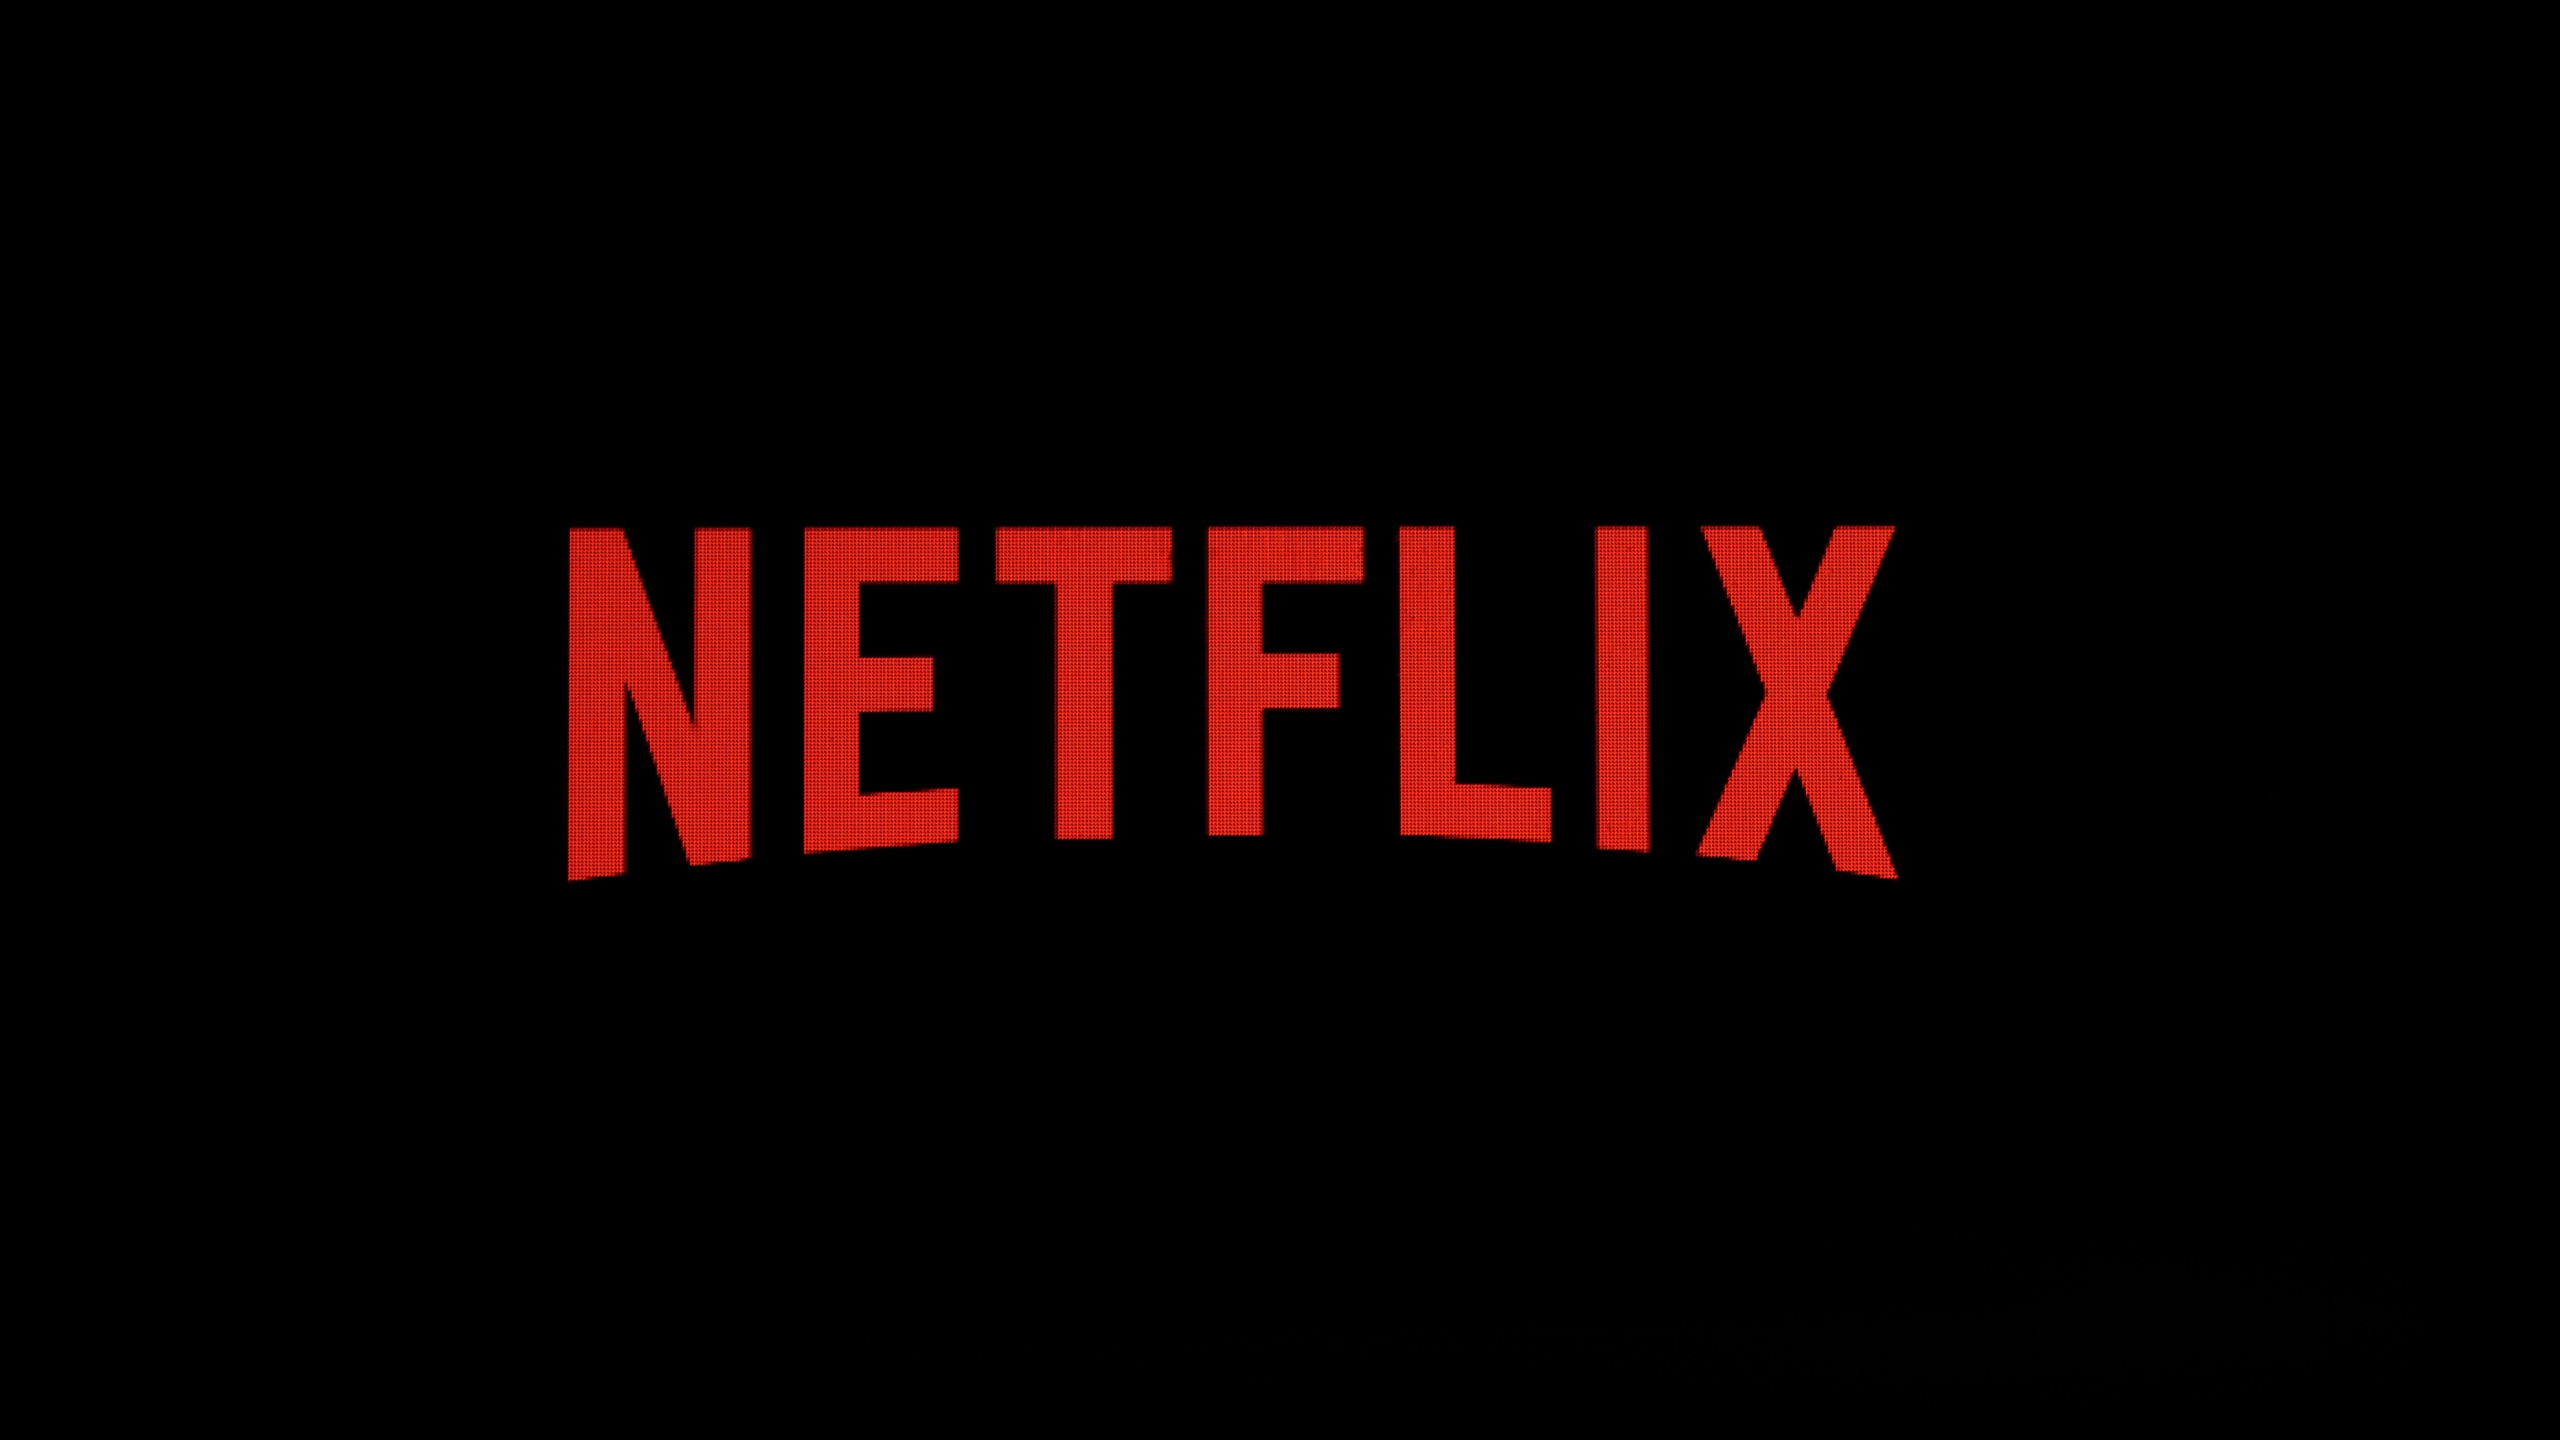 Netflix_Production_Hub_87733-159532.jpg47693353